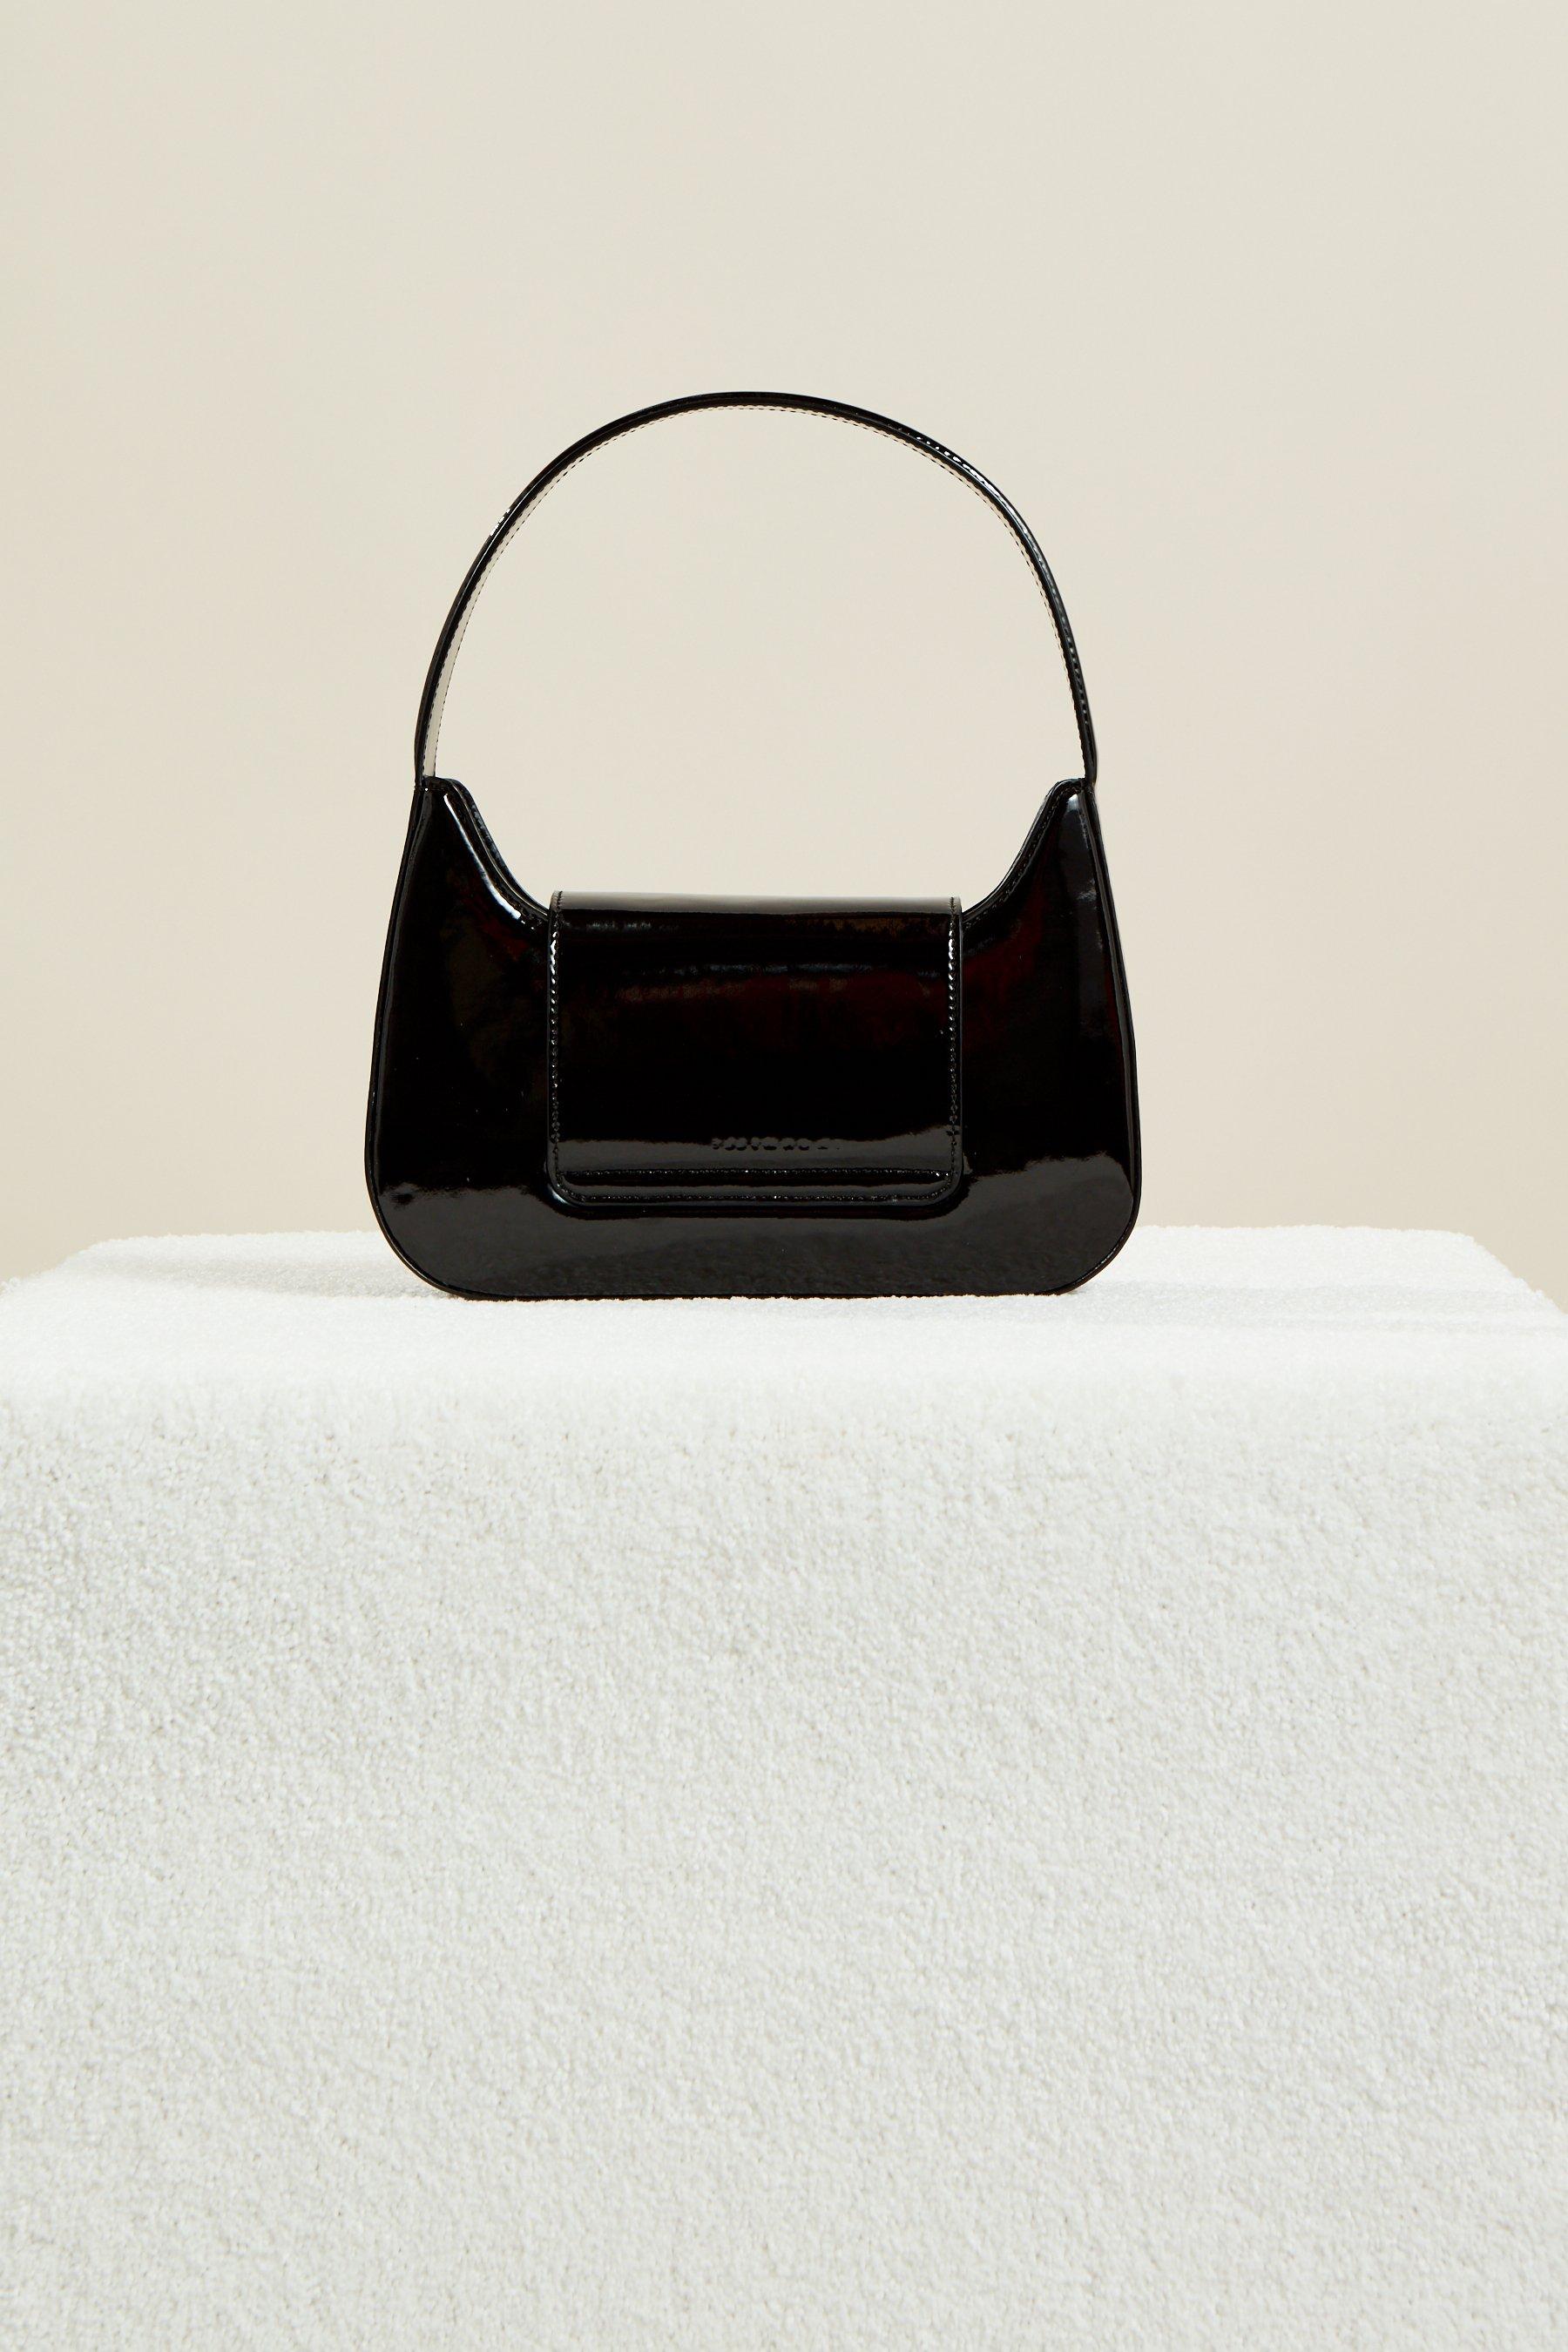 Retro Bag in Black by Simon Miller - 2